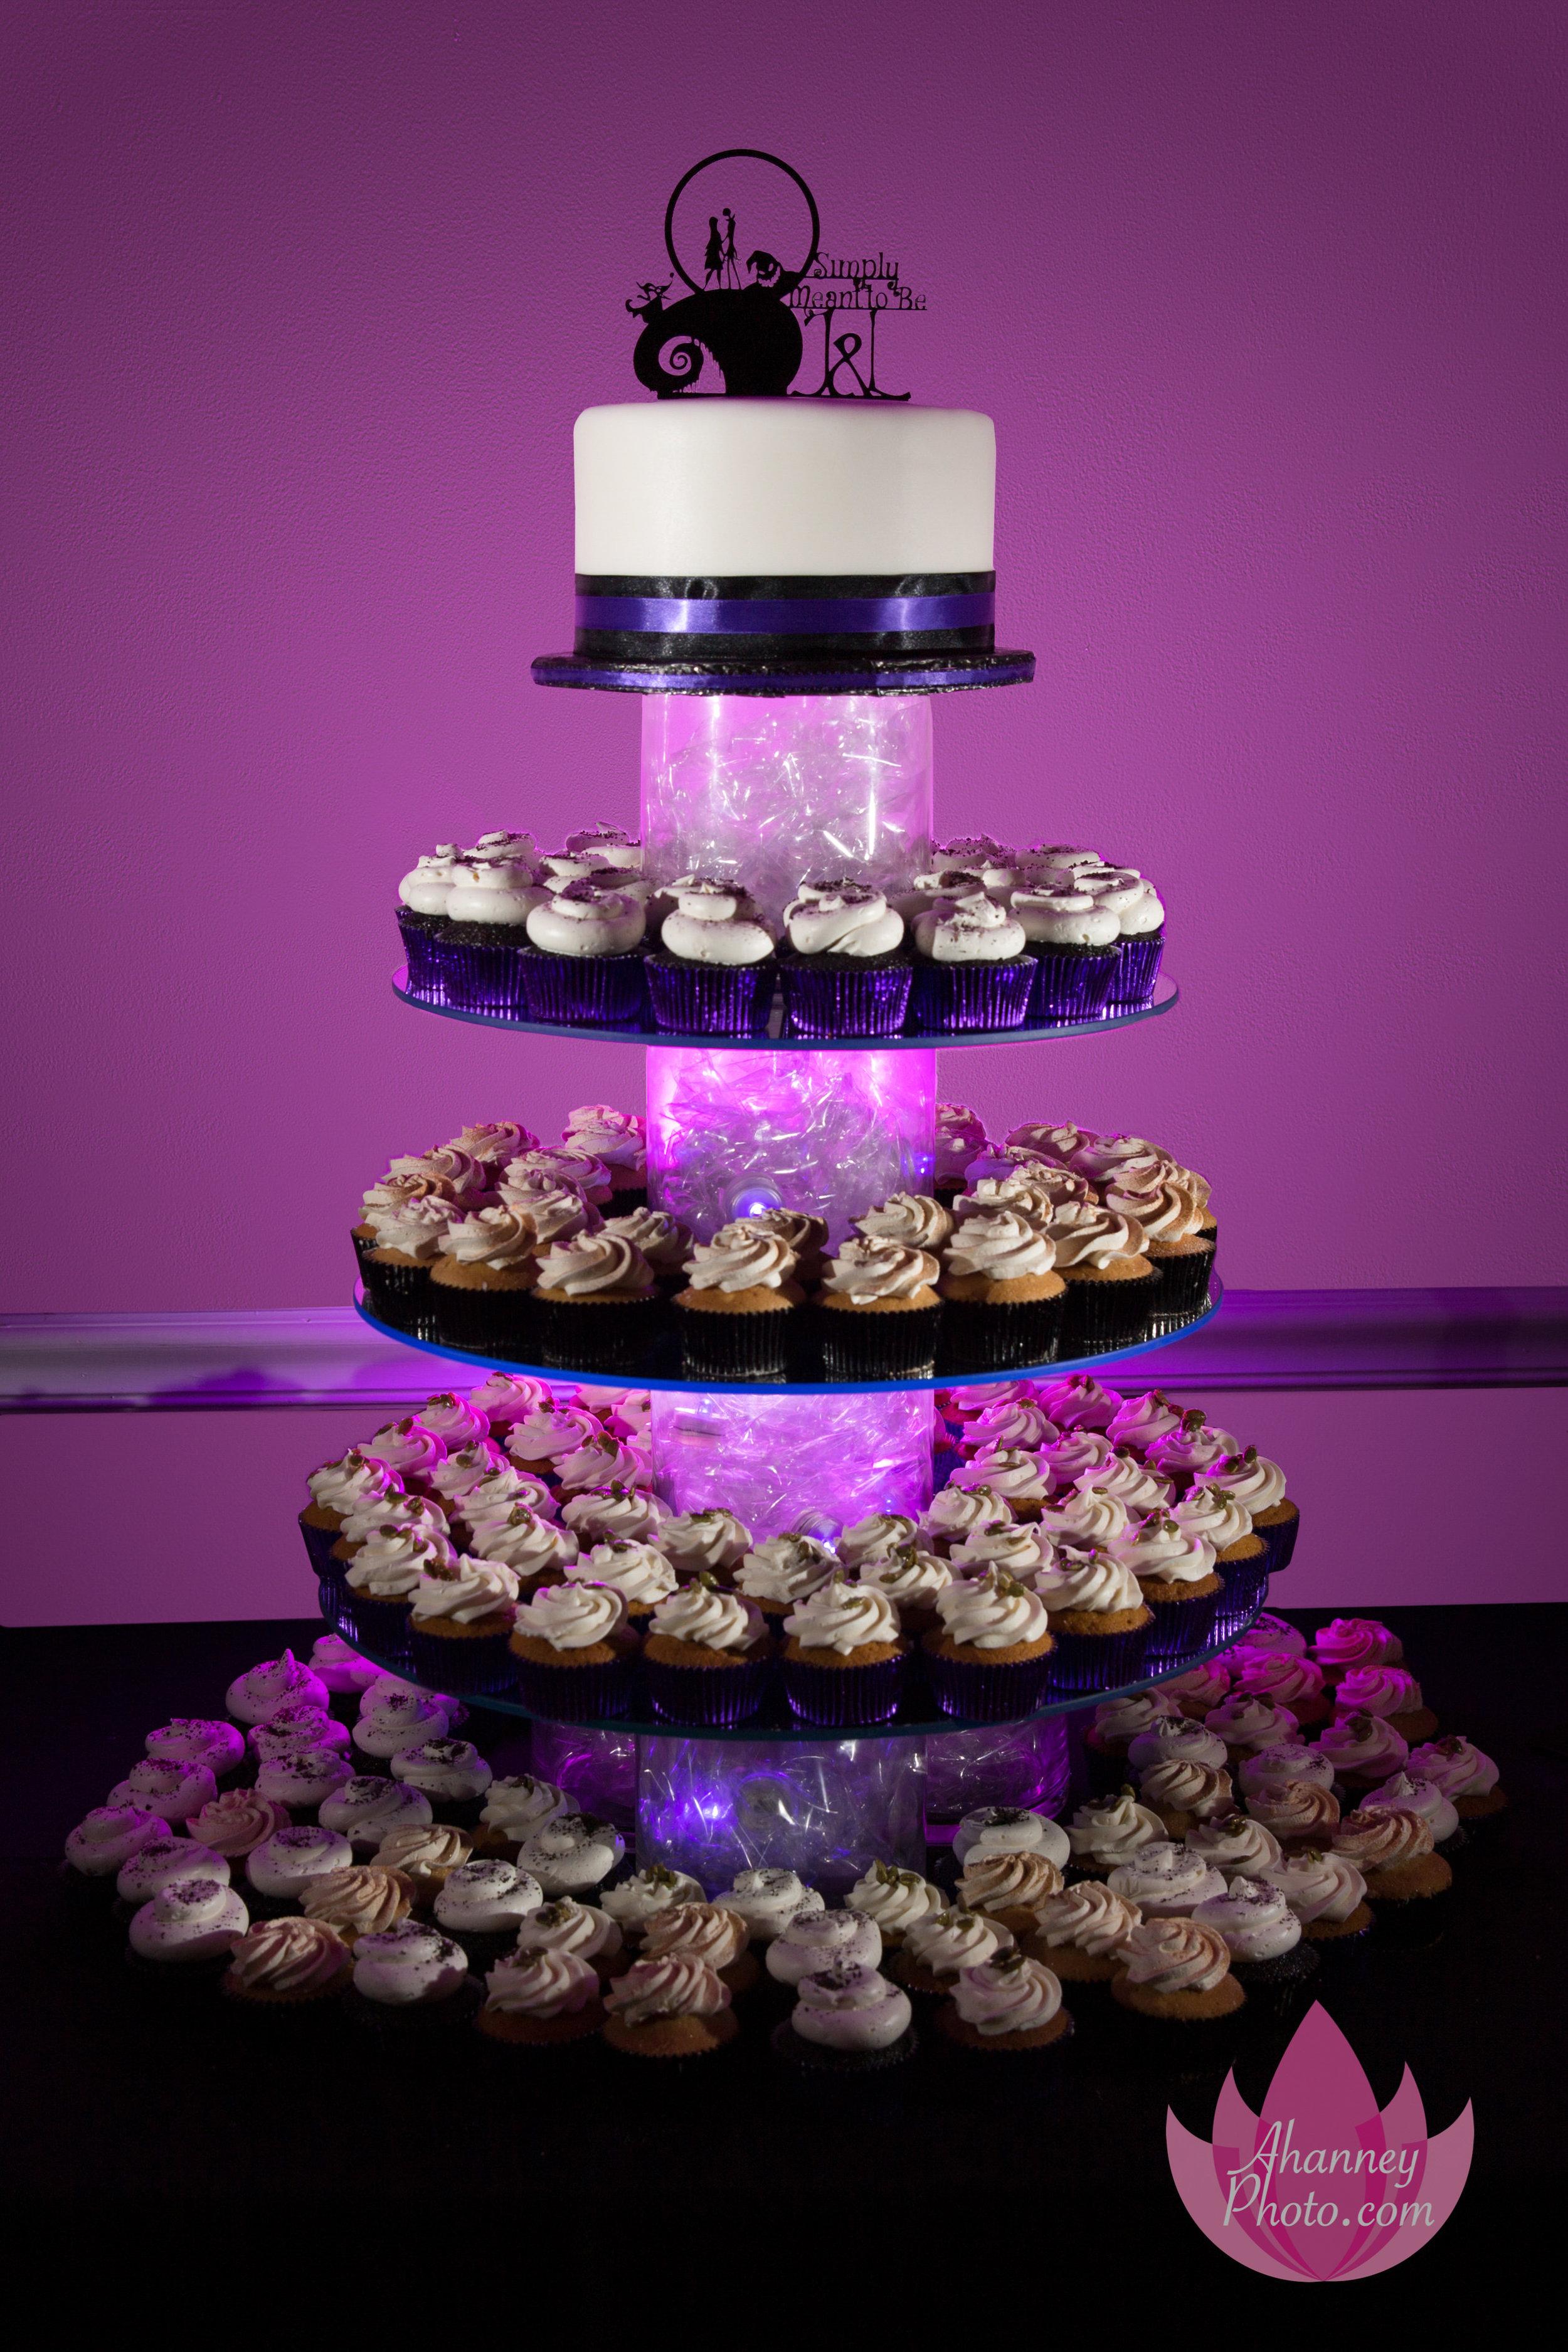 Wedding Cake Cupcake Purple Drexel Hill Pennsylvania New Jersey Philadelphia Delaware Anastasia Hanney Photography AHanneyPhoto